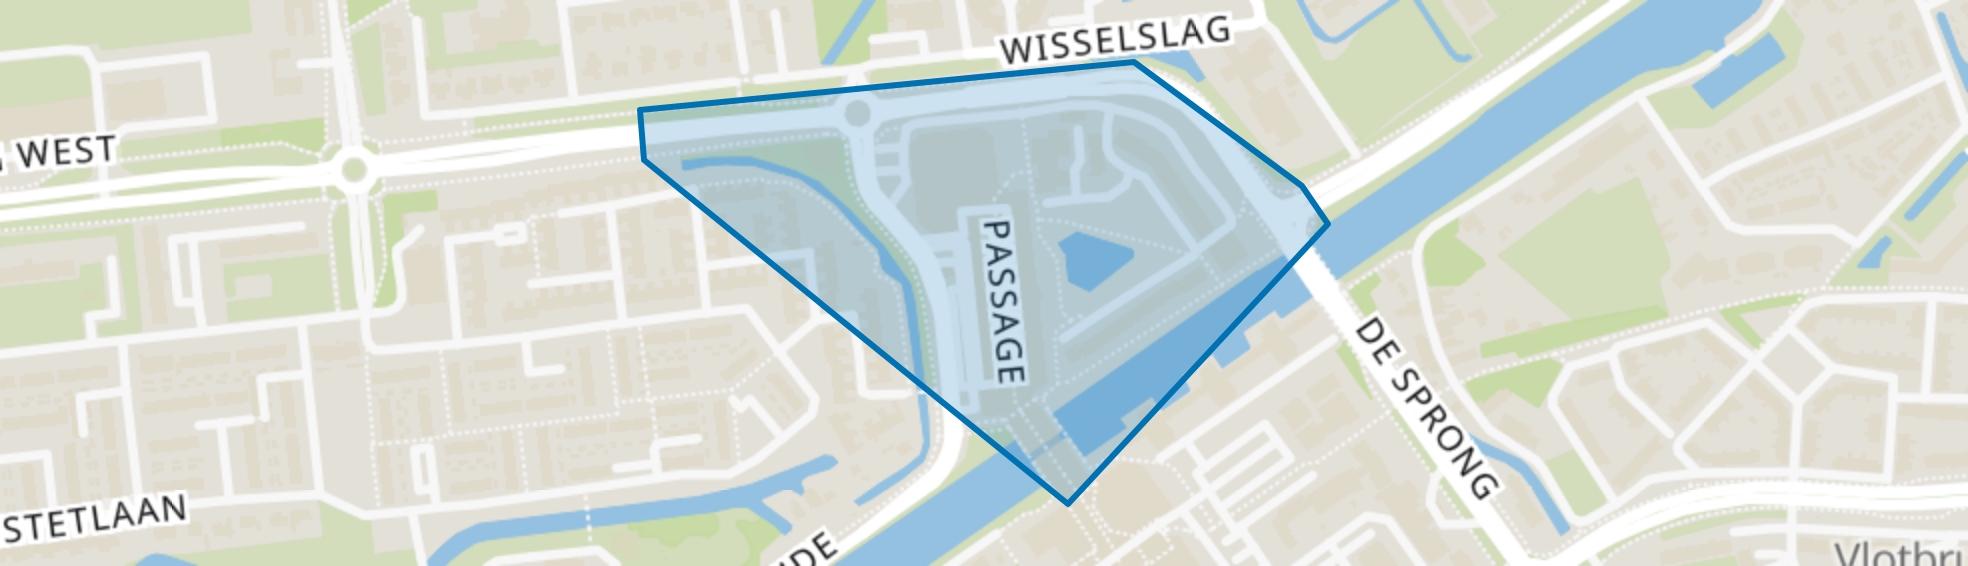 Centrumgebied-West, Hellevoetsluis map